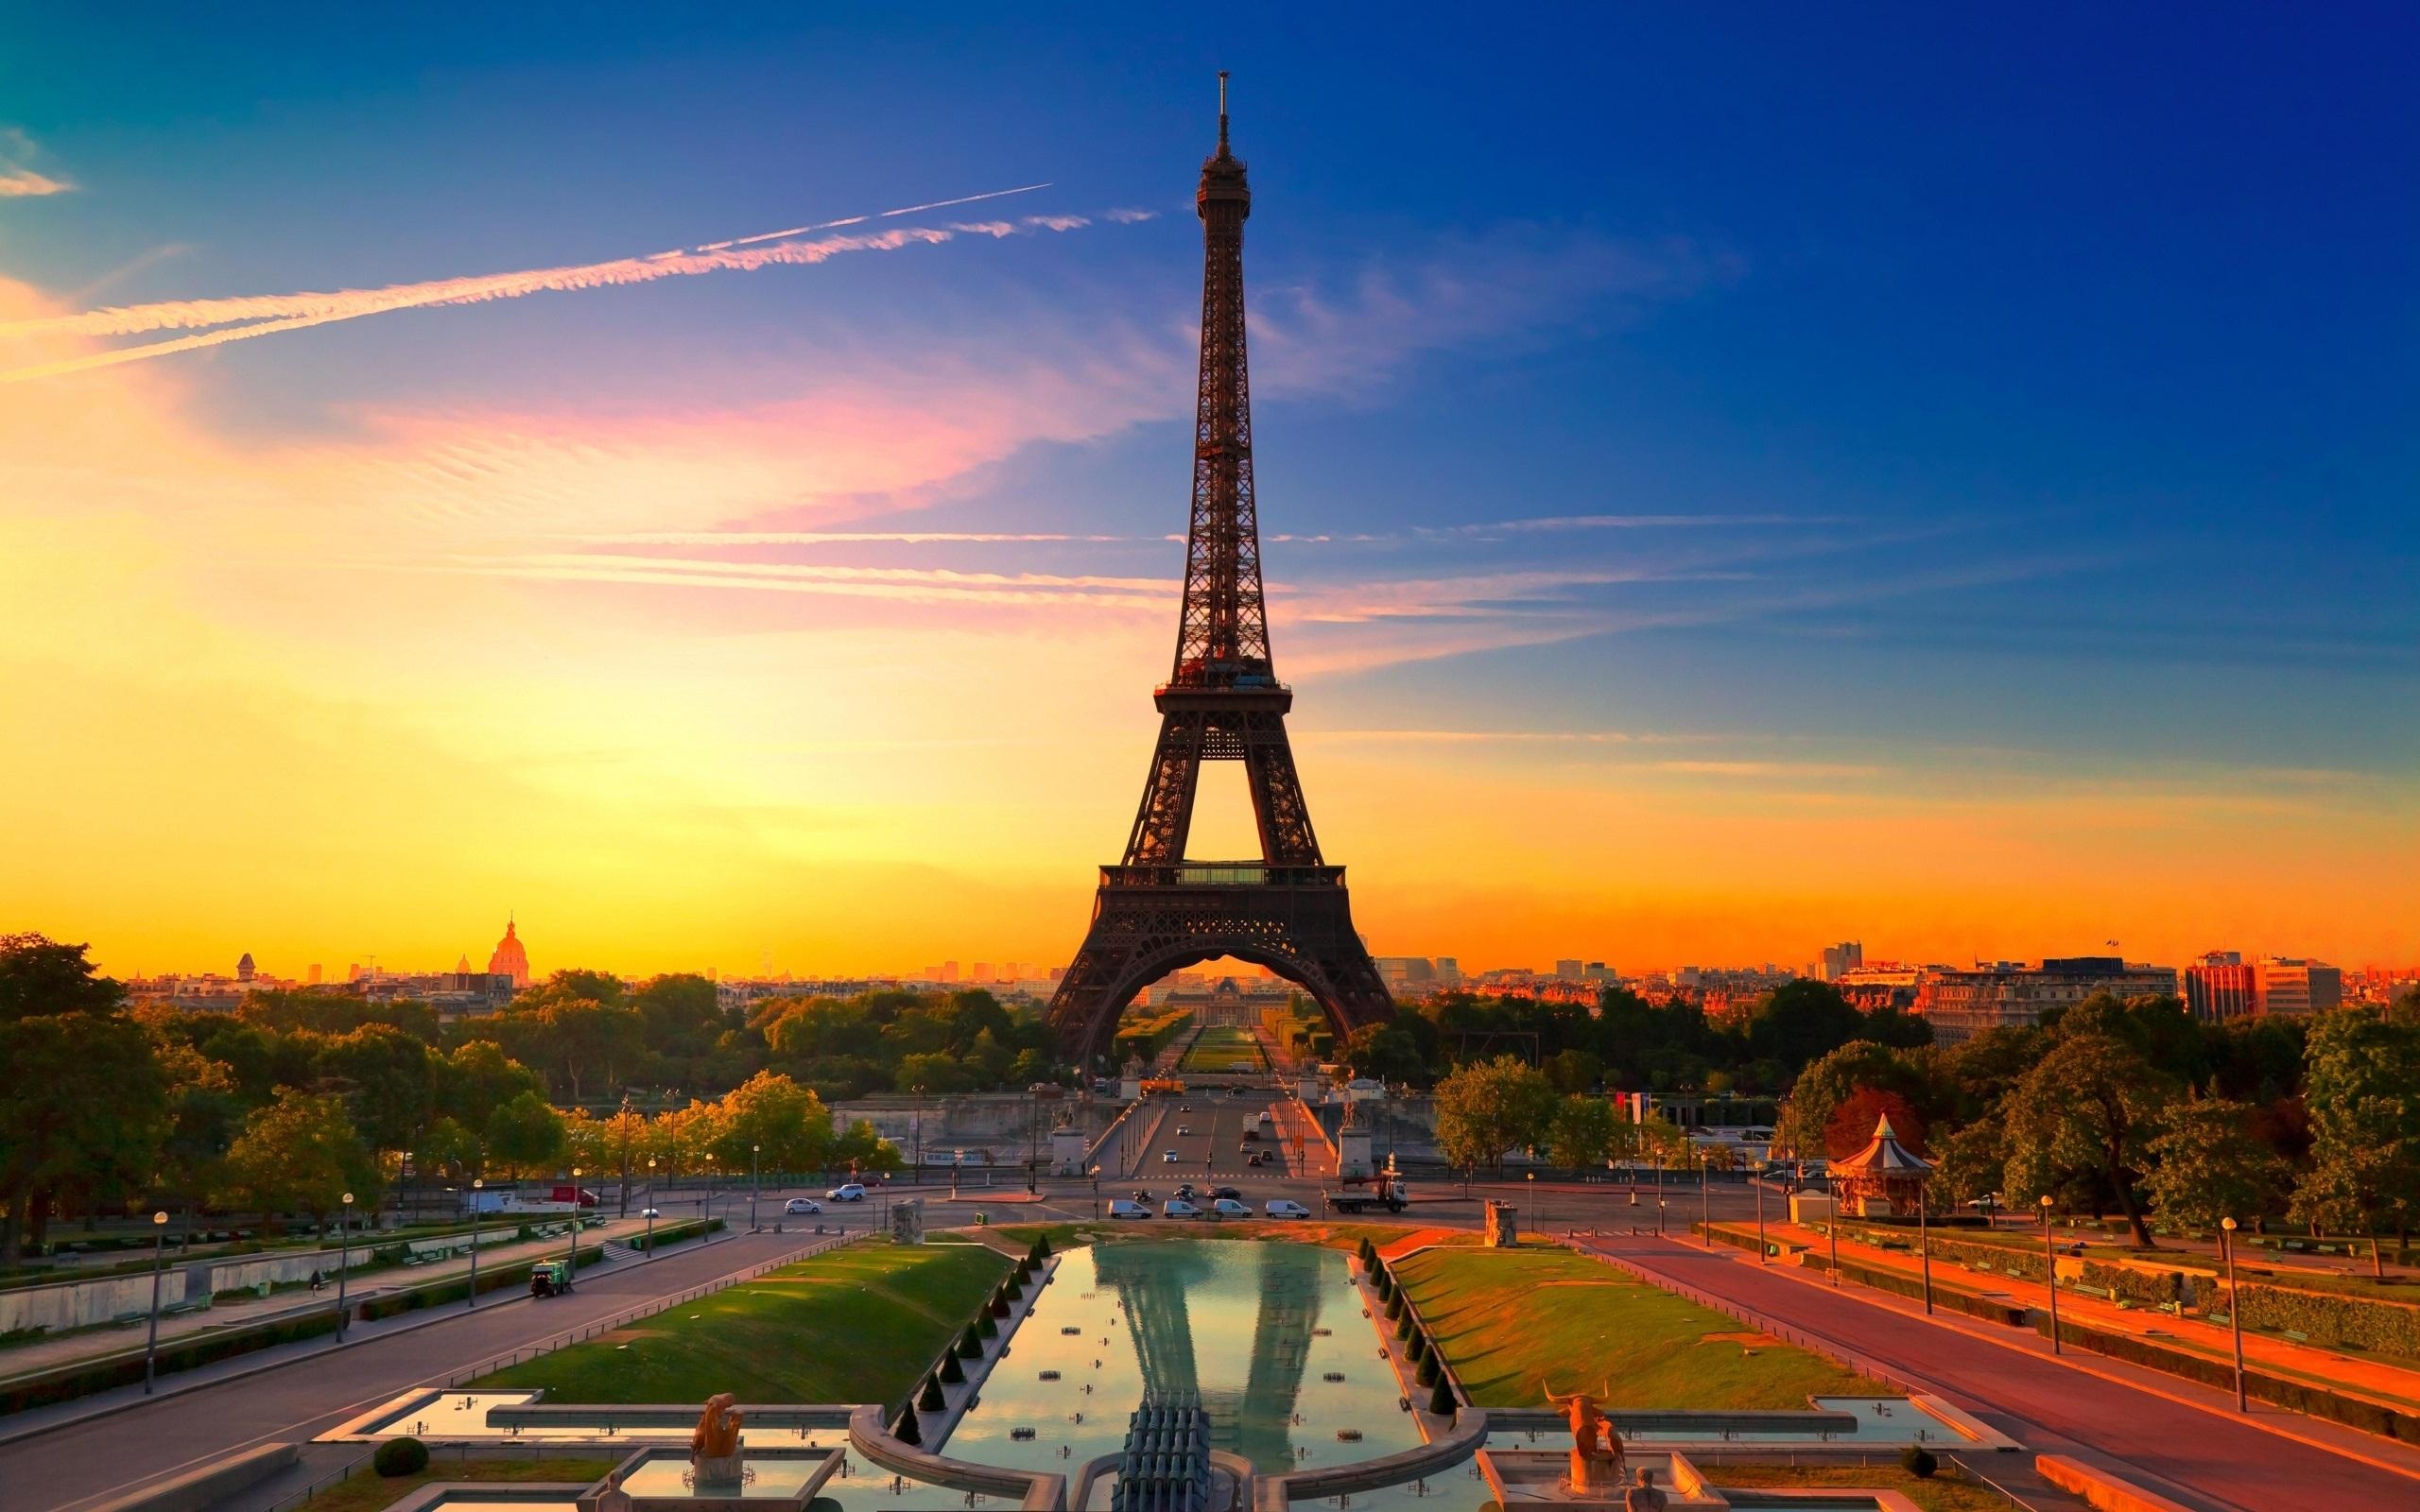 ------* SIEMPRE NOS QUEDARA PARIS *------ - Página 3 Paris